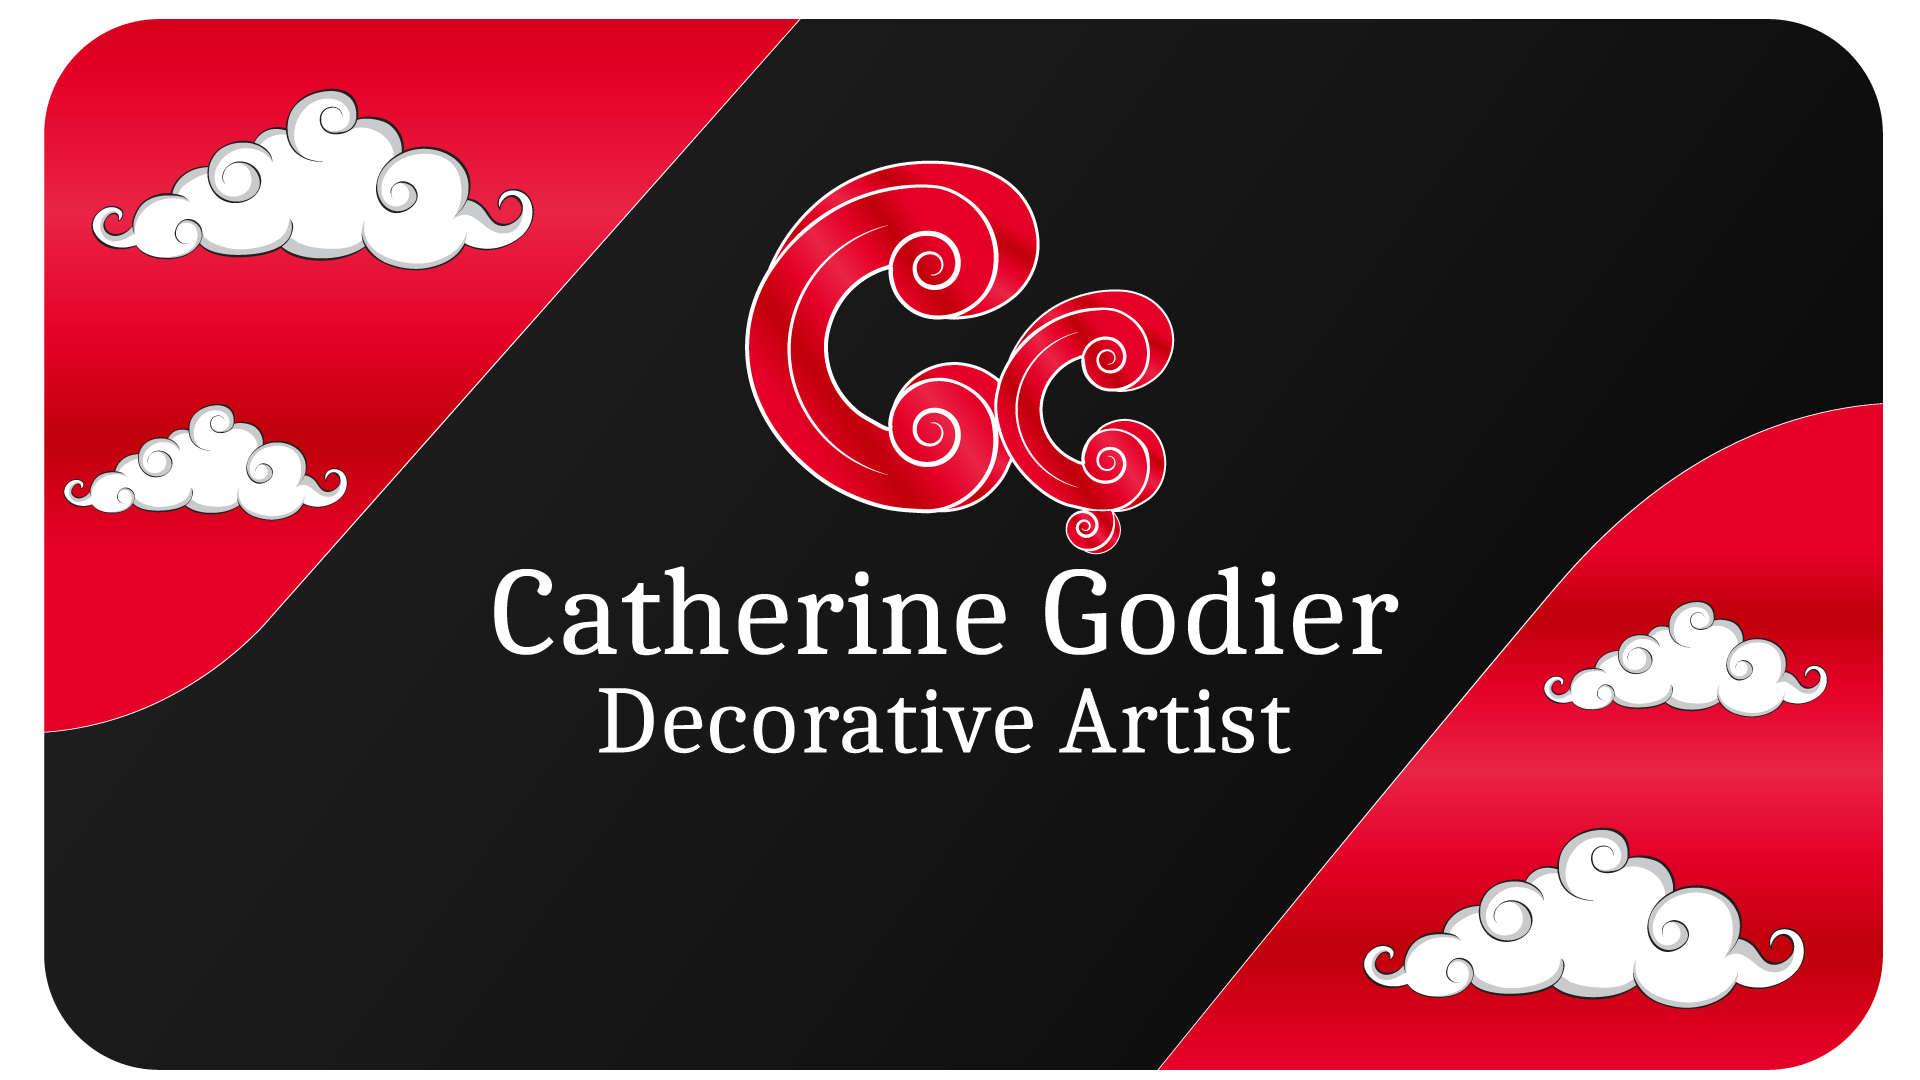 catherine-godier-decorative-artist